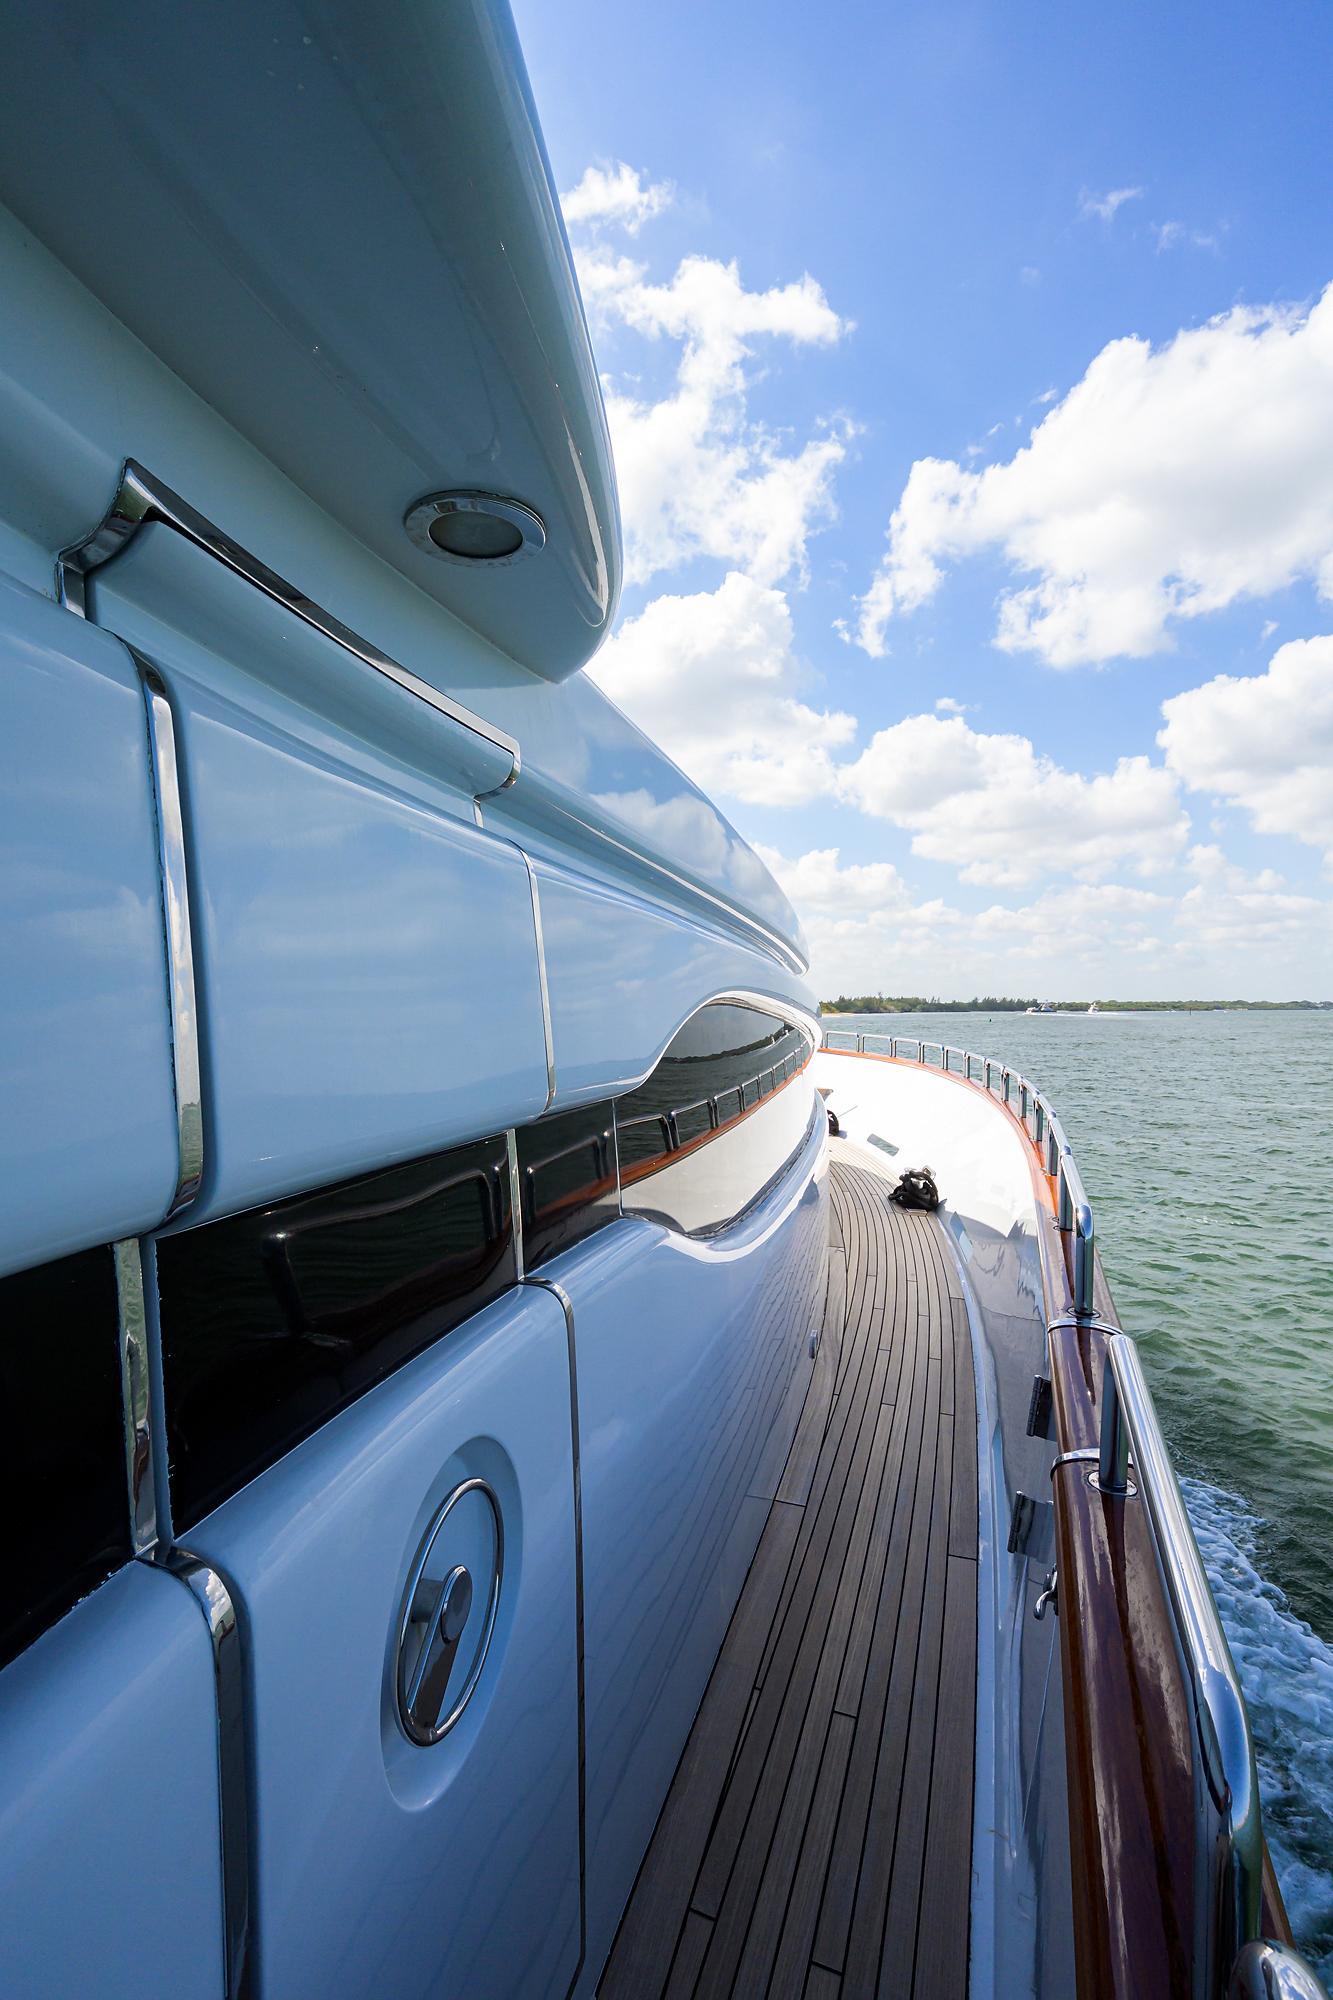 98 Destiny - My Destiny Starboard Passageway